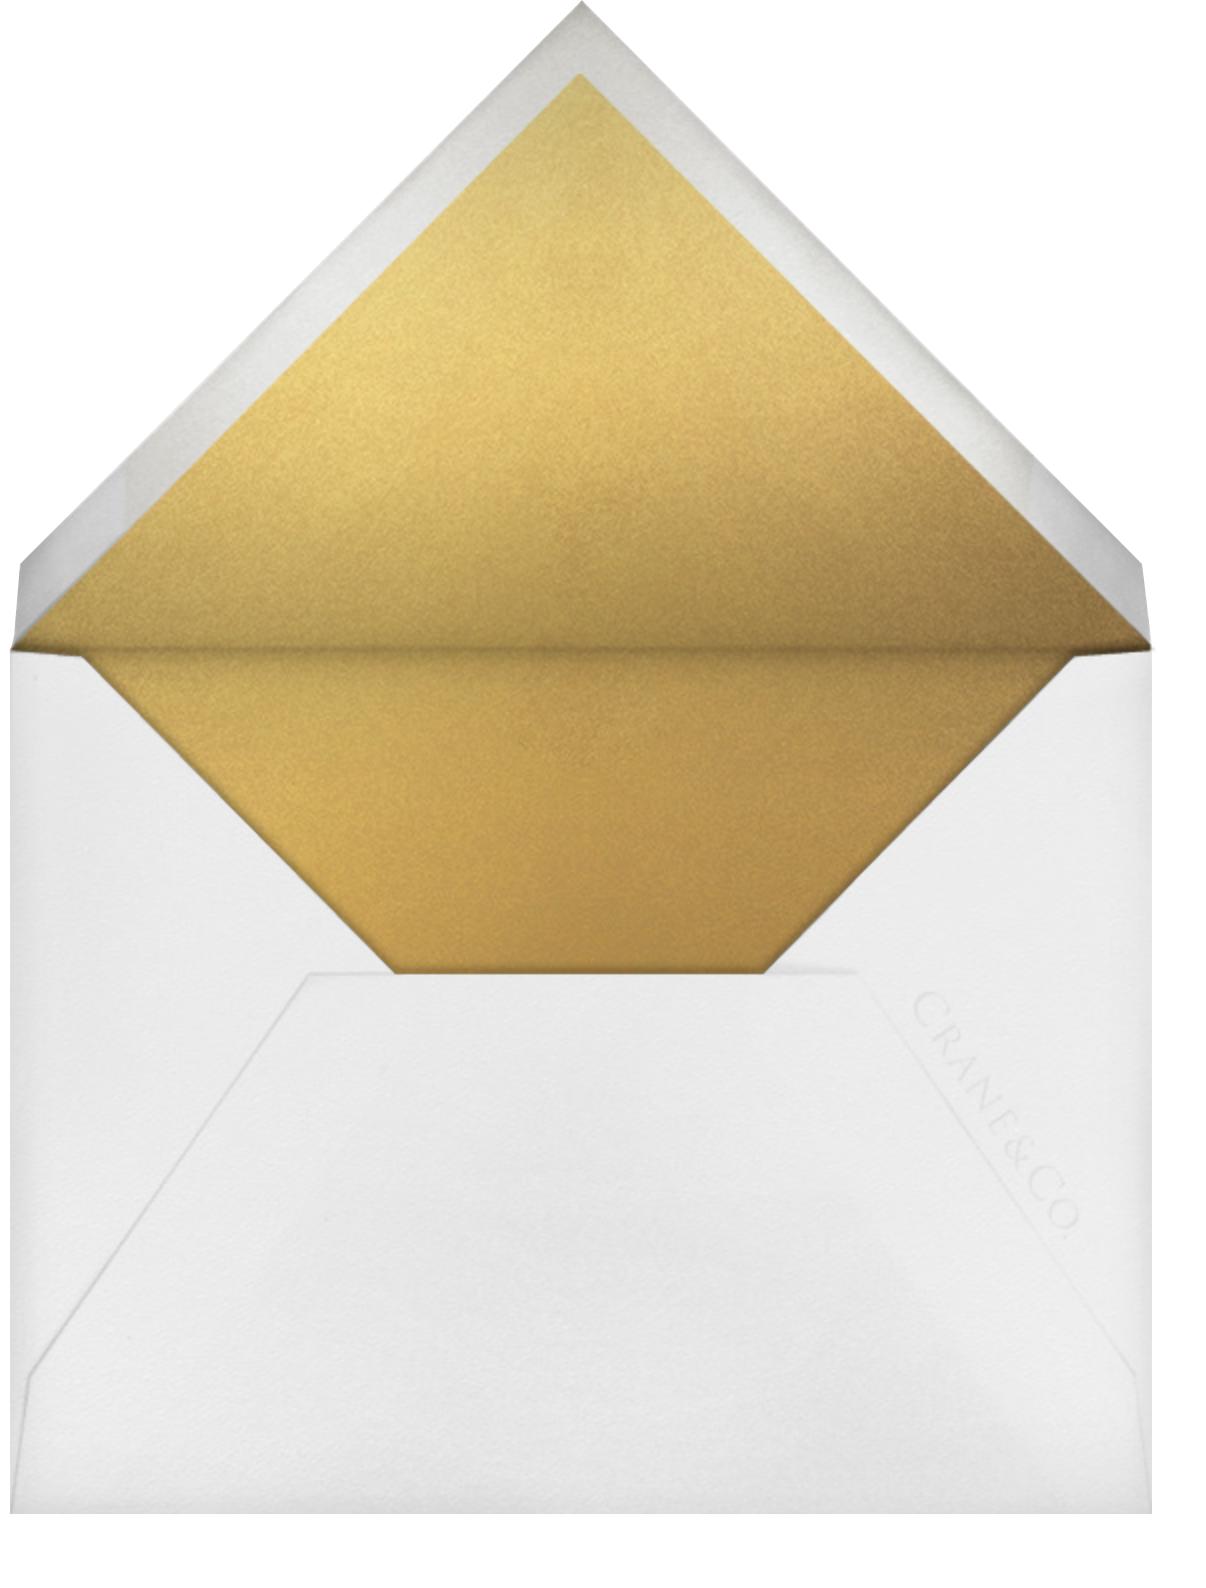 Antique Lace (Thank You) - Medium Gold - Oscar de la Renta - Personalized stationery - envelope back